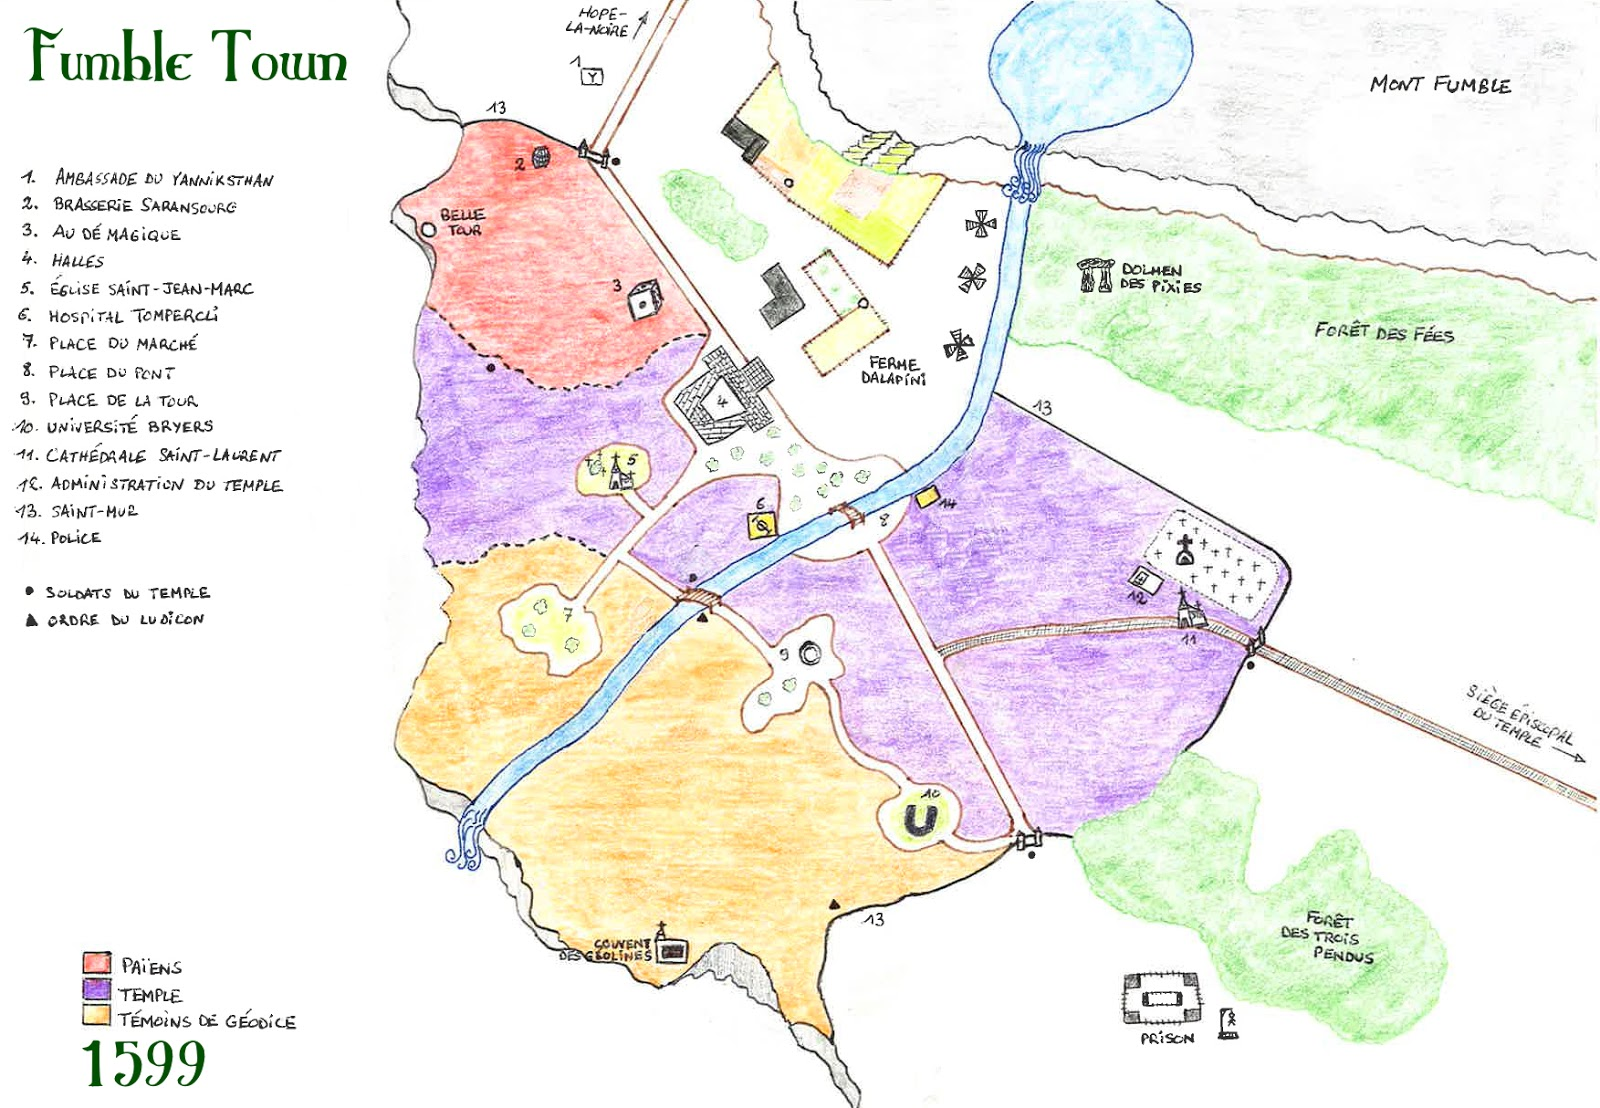 Fumble Town en 1599